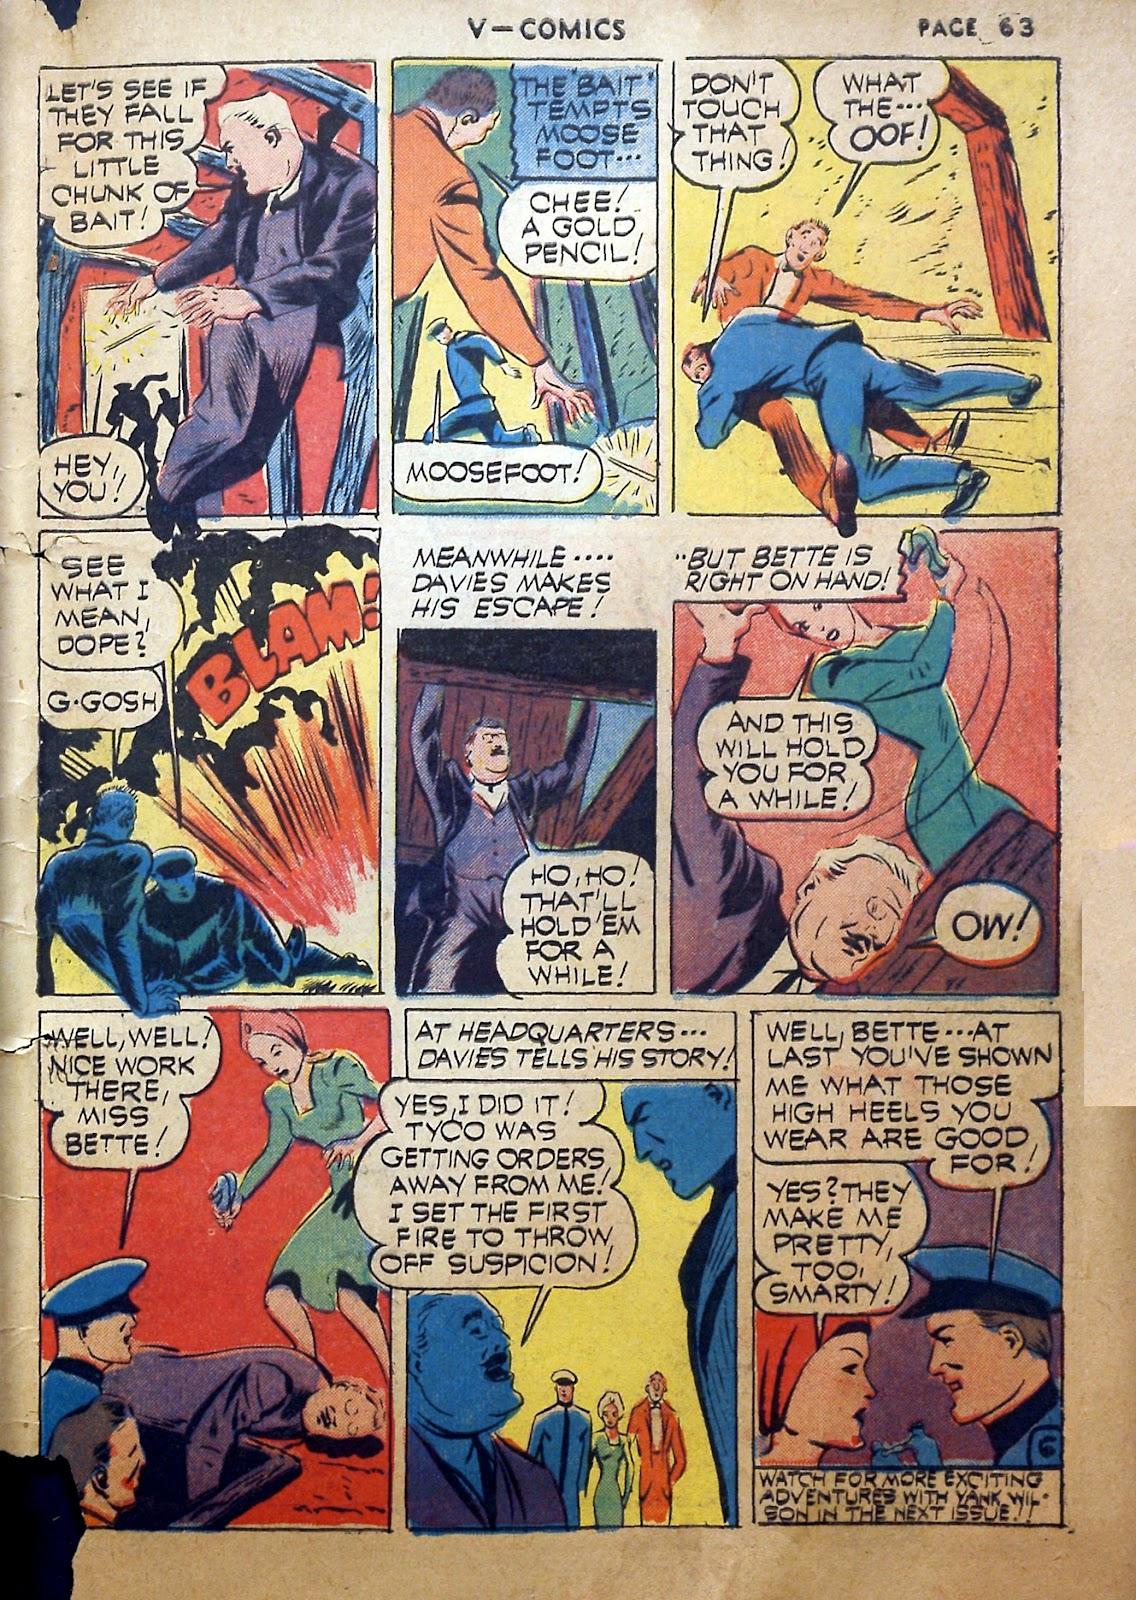 Read online V...- Comics comic -  Issue #2 - 64